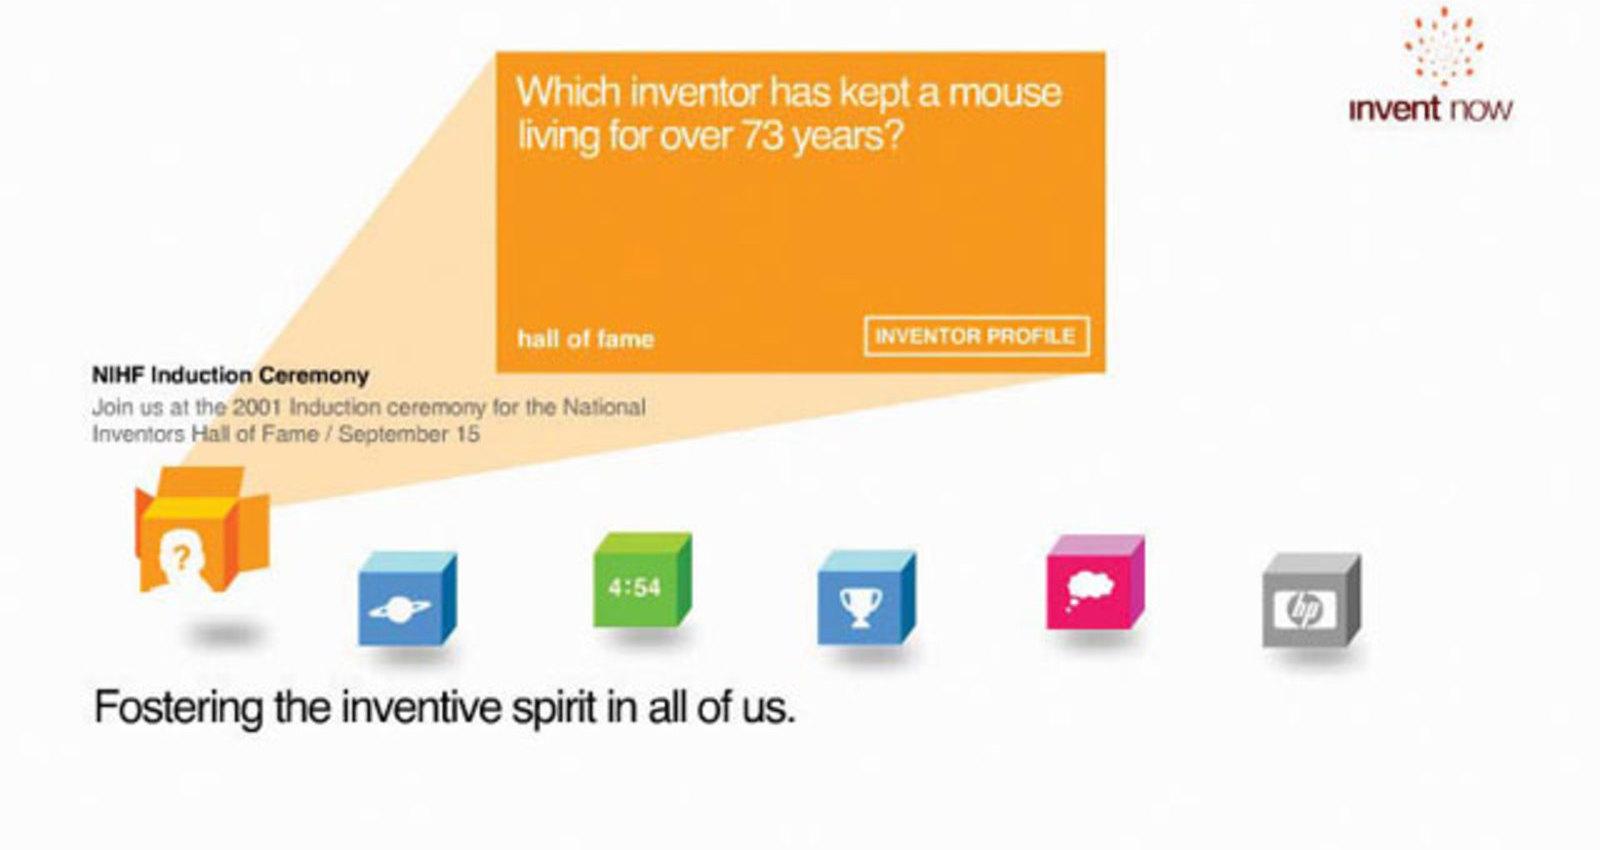 invent now